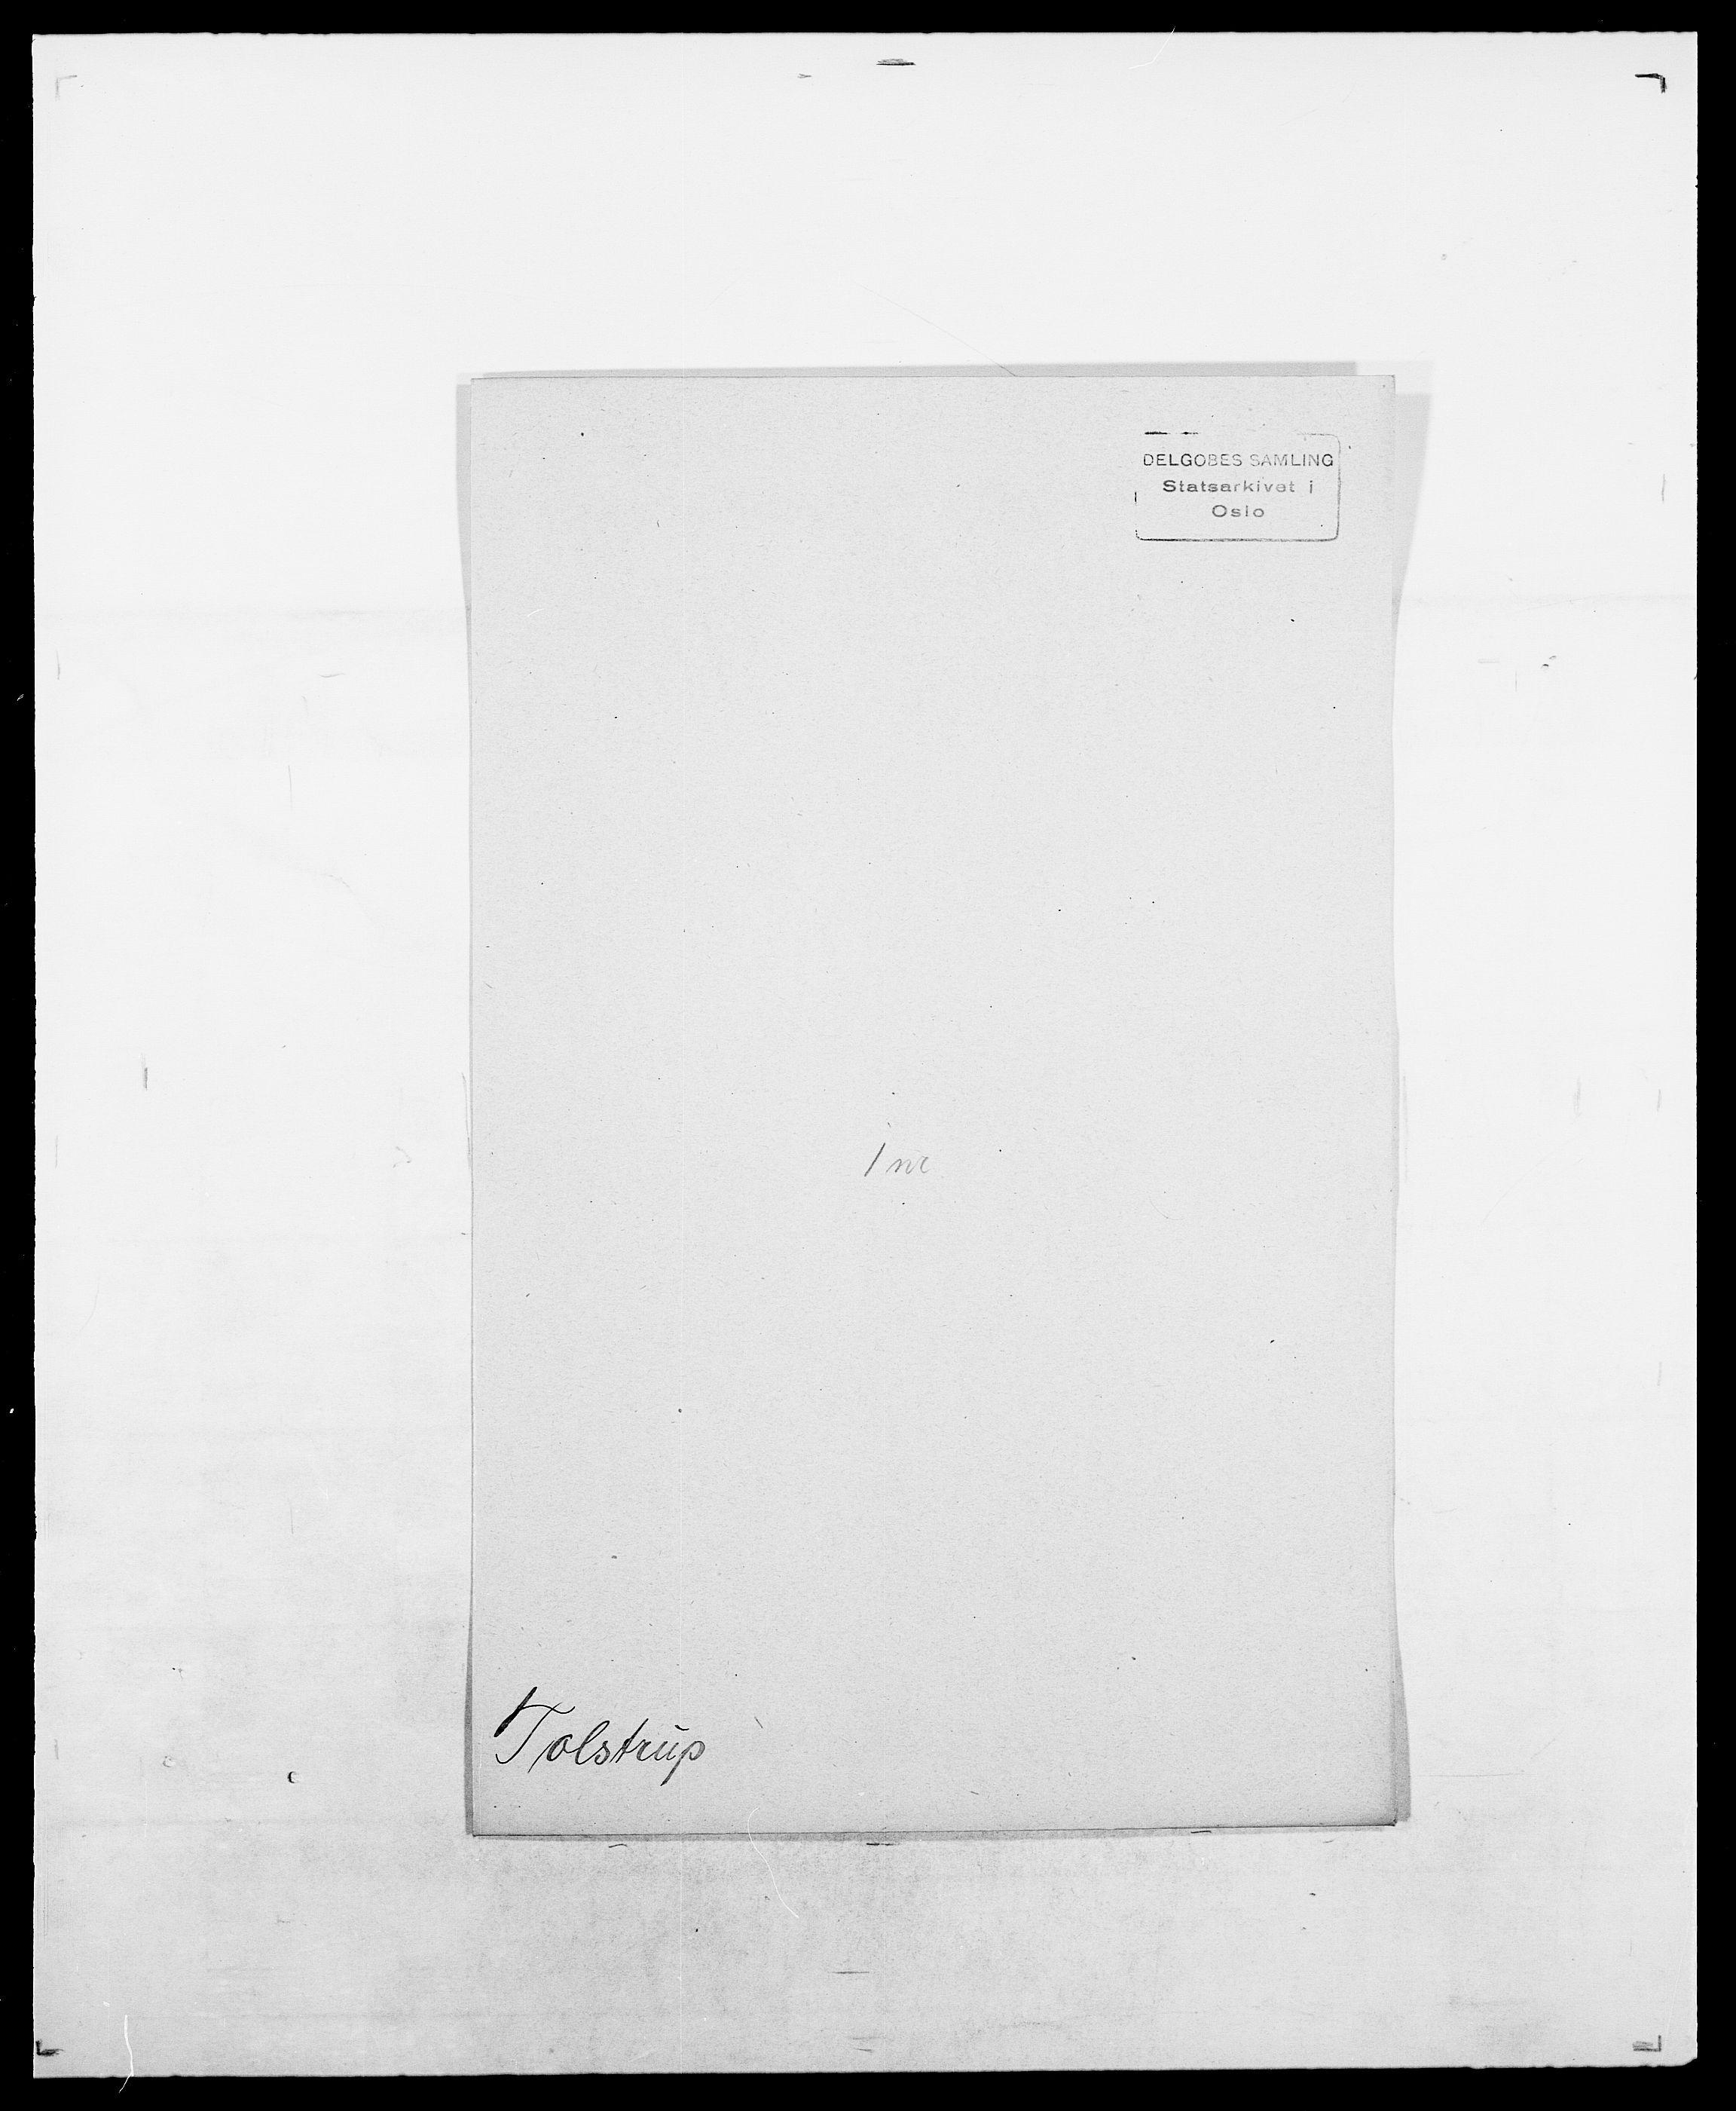 SAO, Delgobe, Charles Antoine - samling, D/Da/L0039: Thorsen - Urup, s. 132